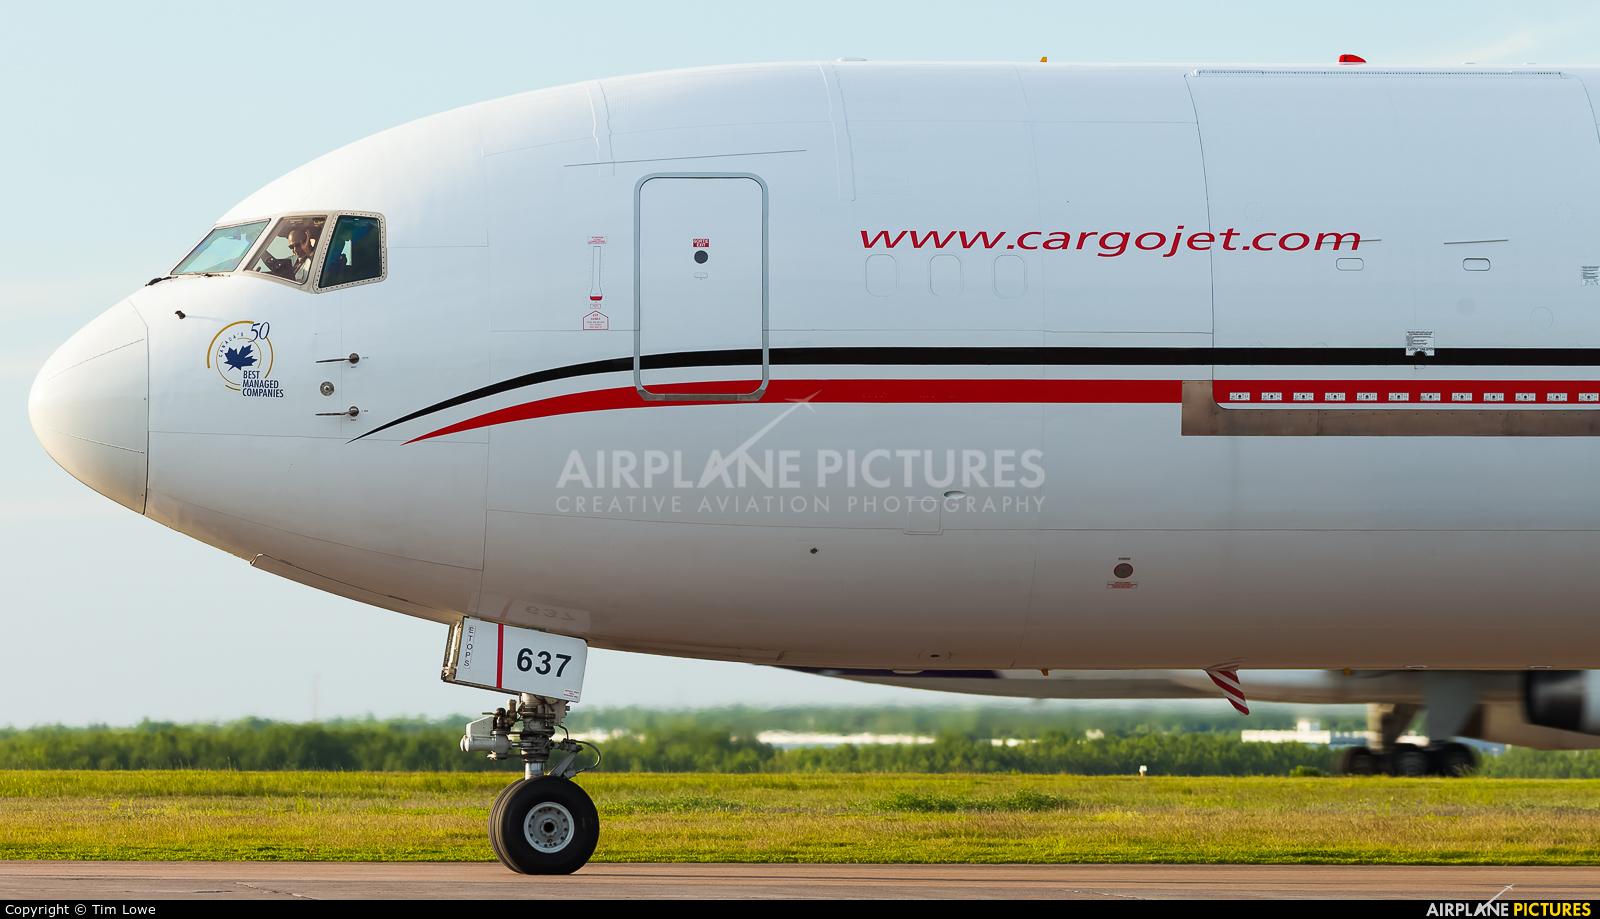 Cargojet Airways C-GVIJ aircraft at greater Moncton International